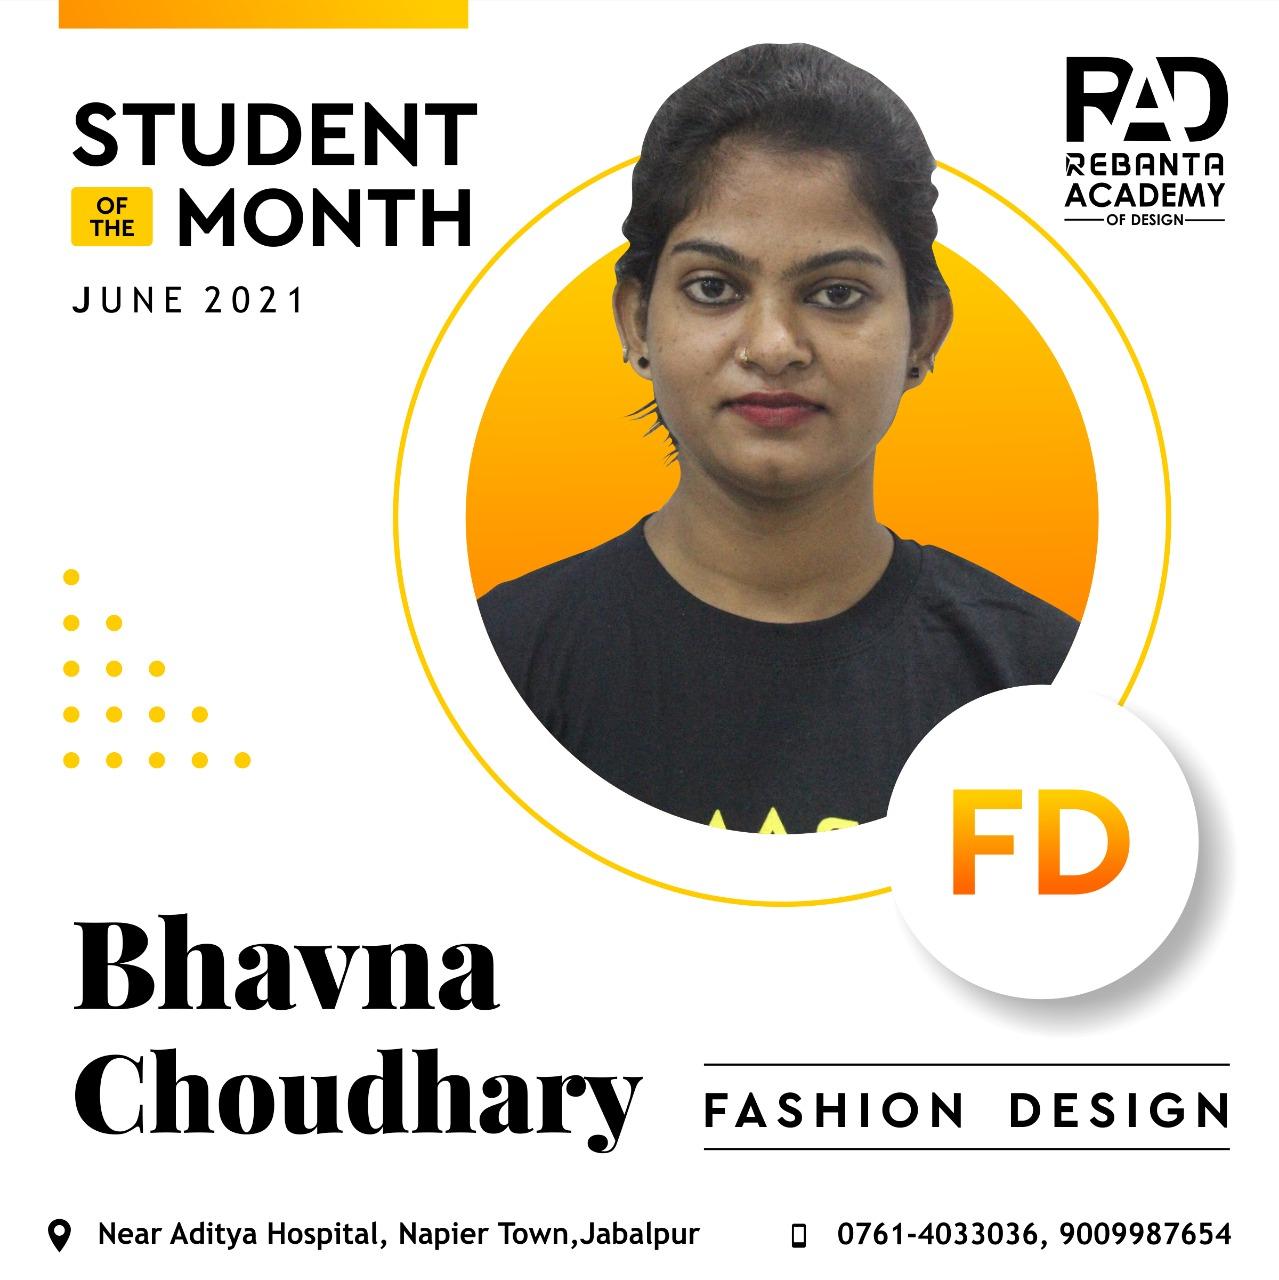 Rebant Aacademy Of Design